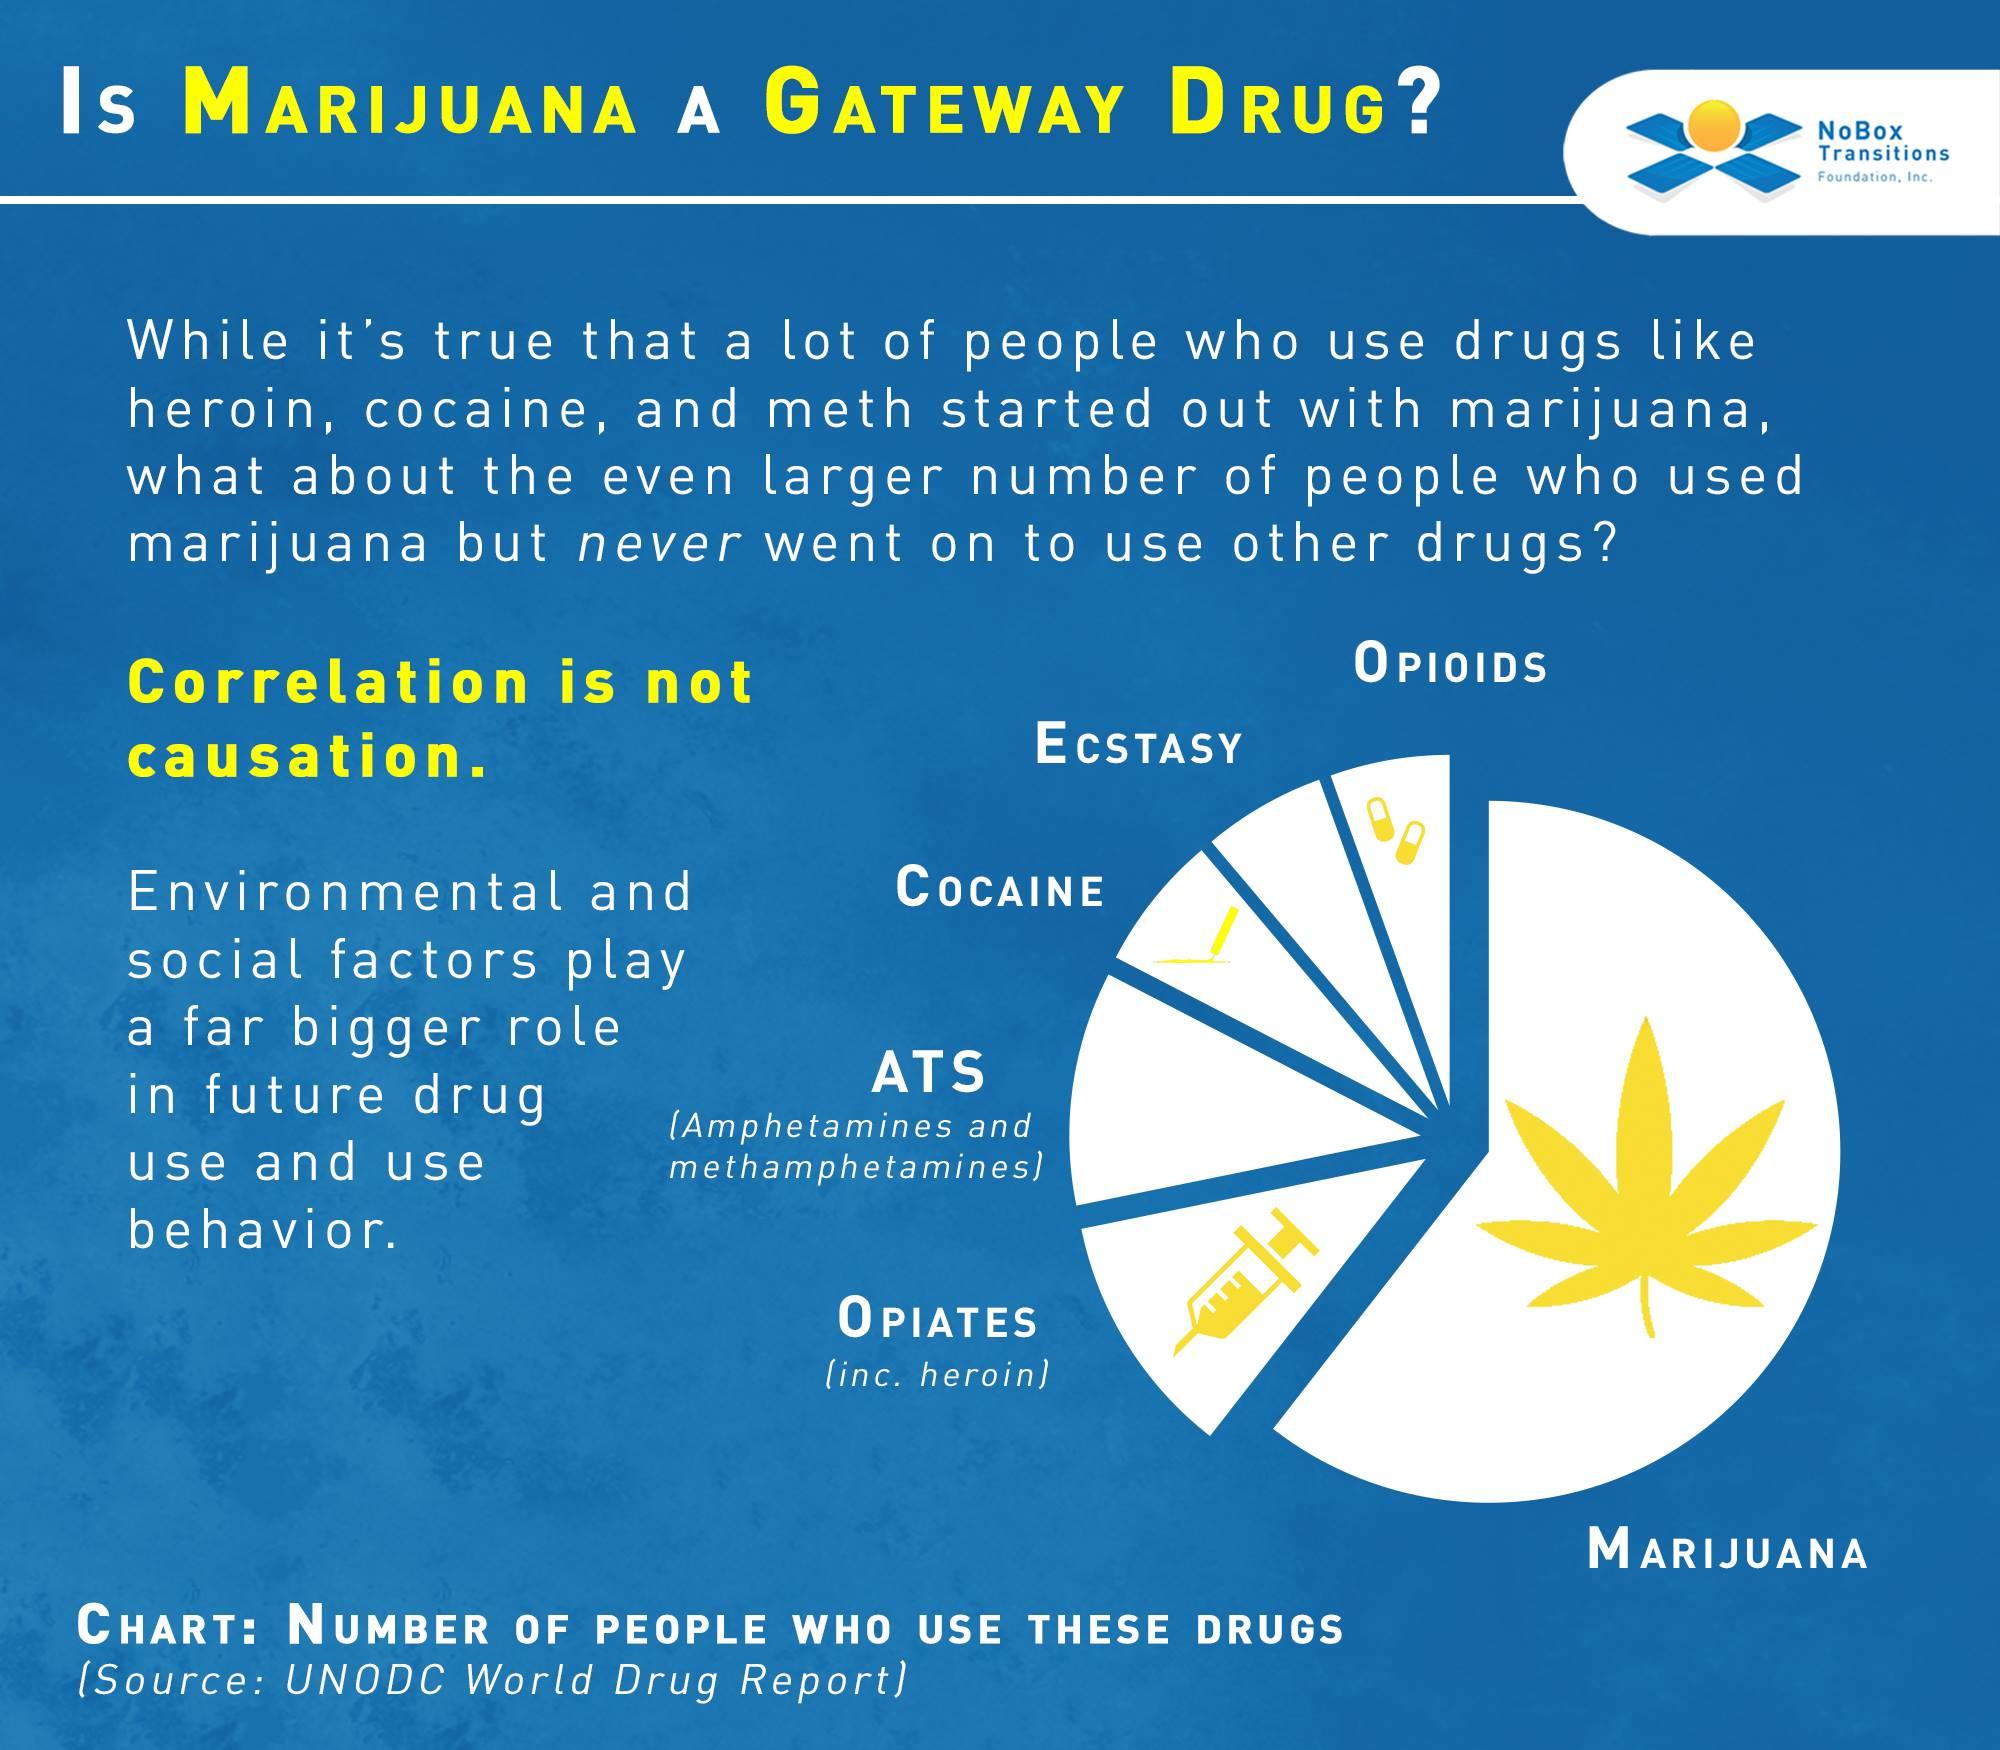 Marijuana as gateway drug